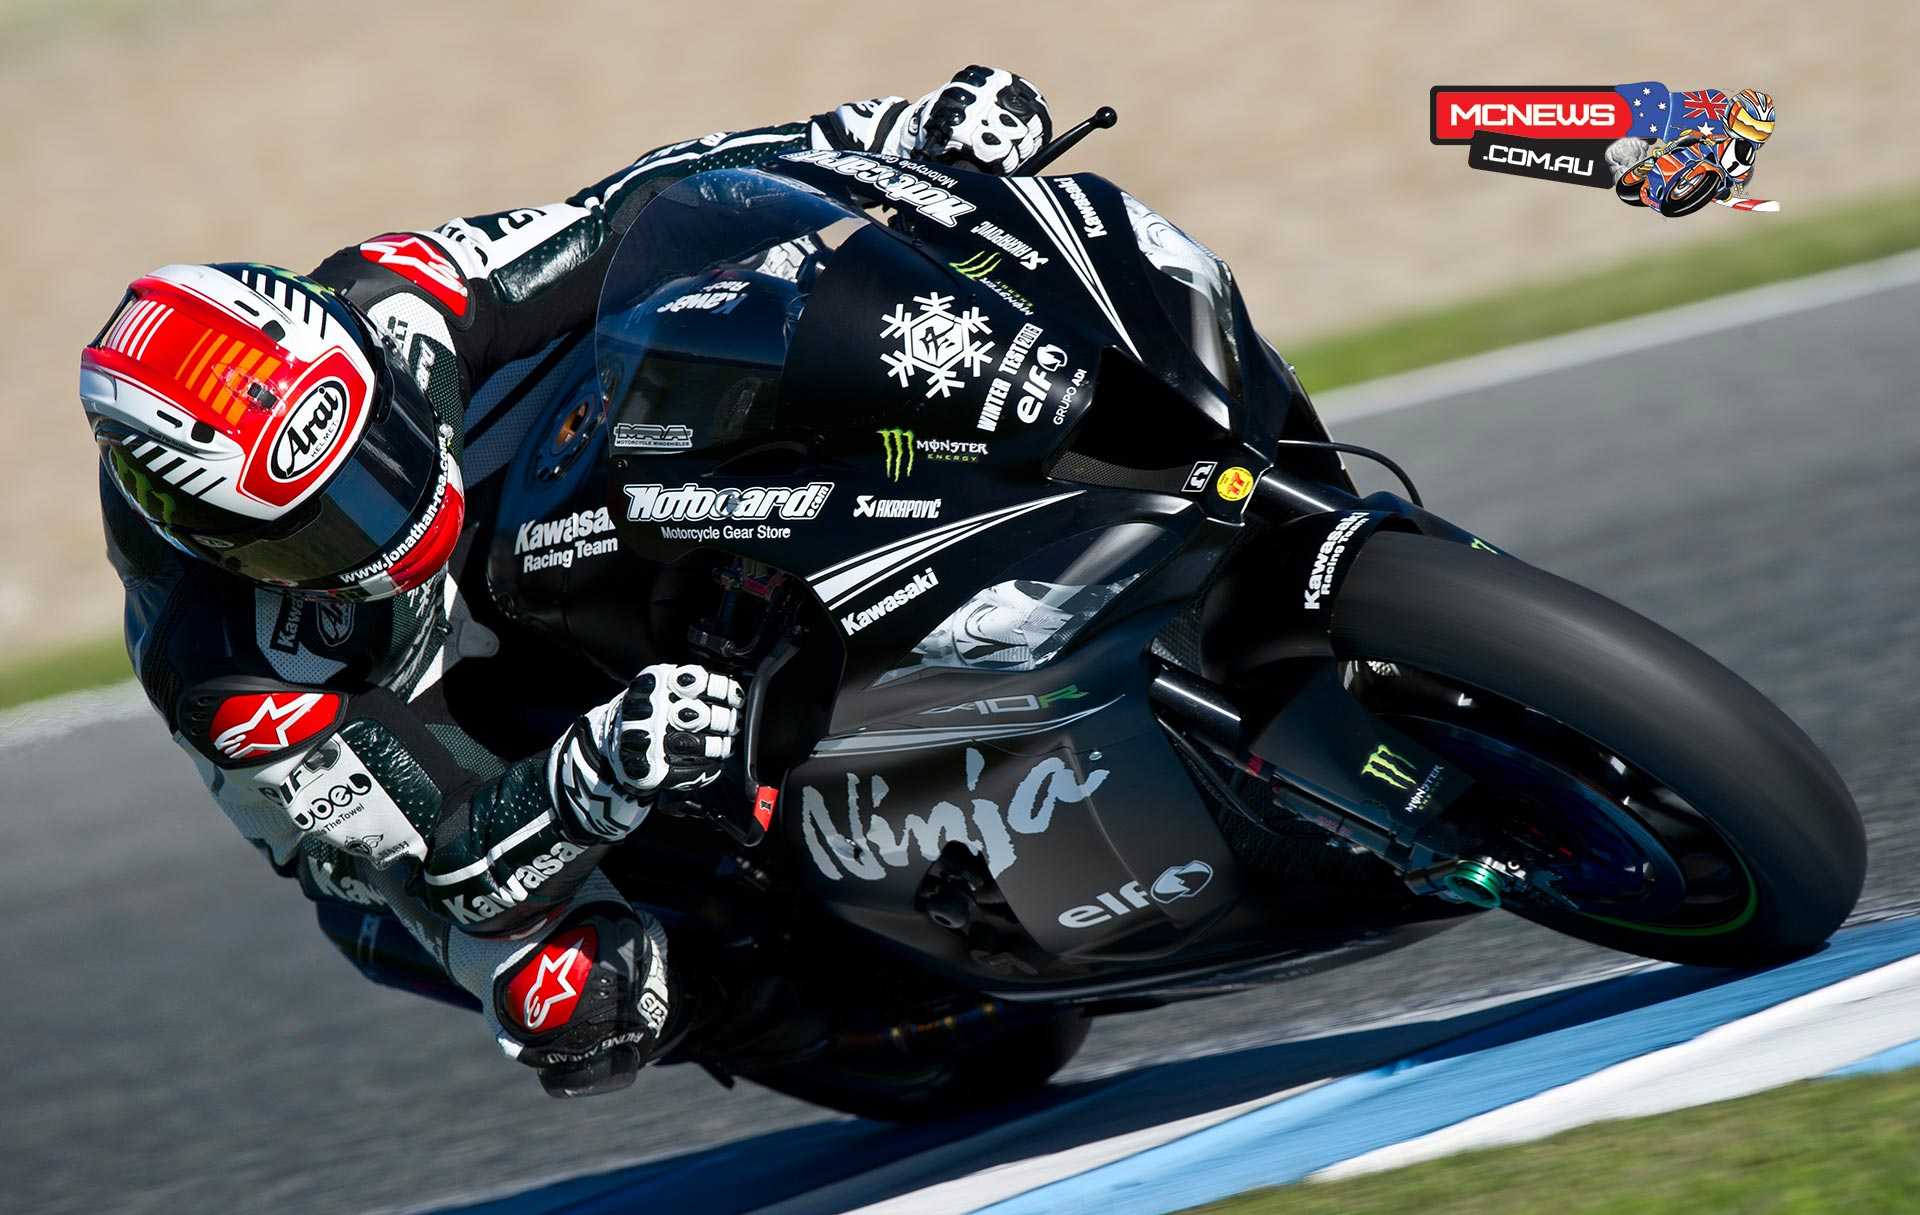 Jonathan Rea tops day one of Jerez WorldSBK Testing